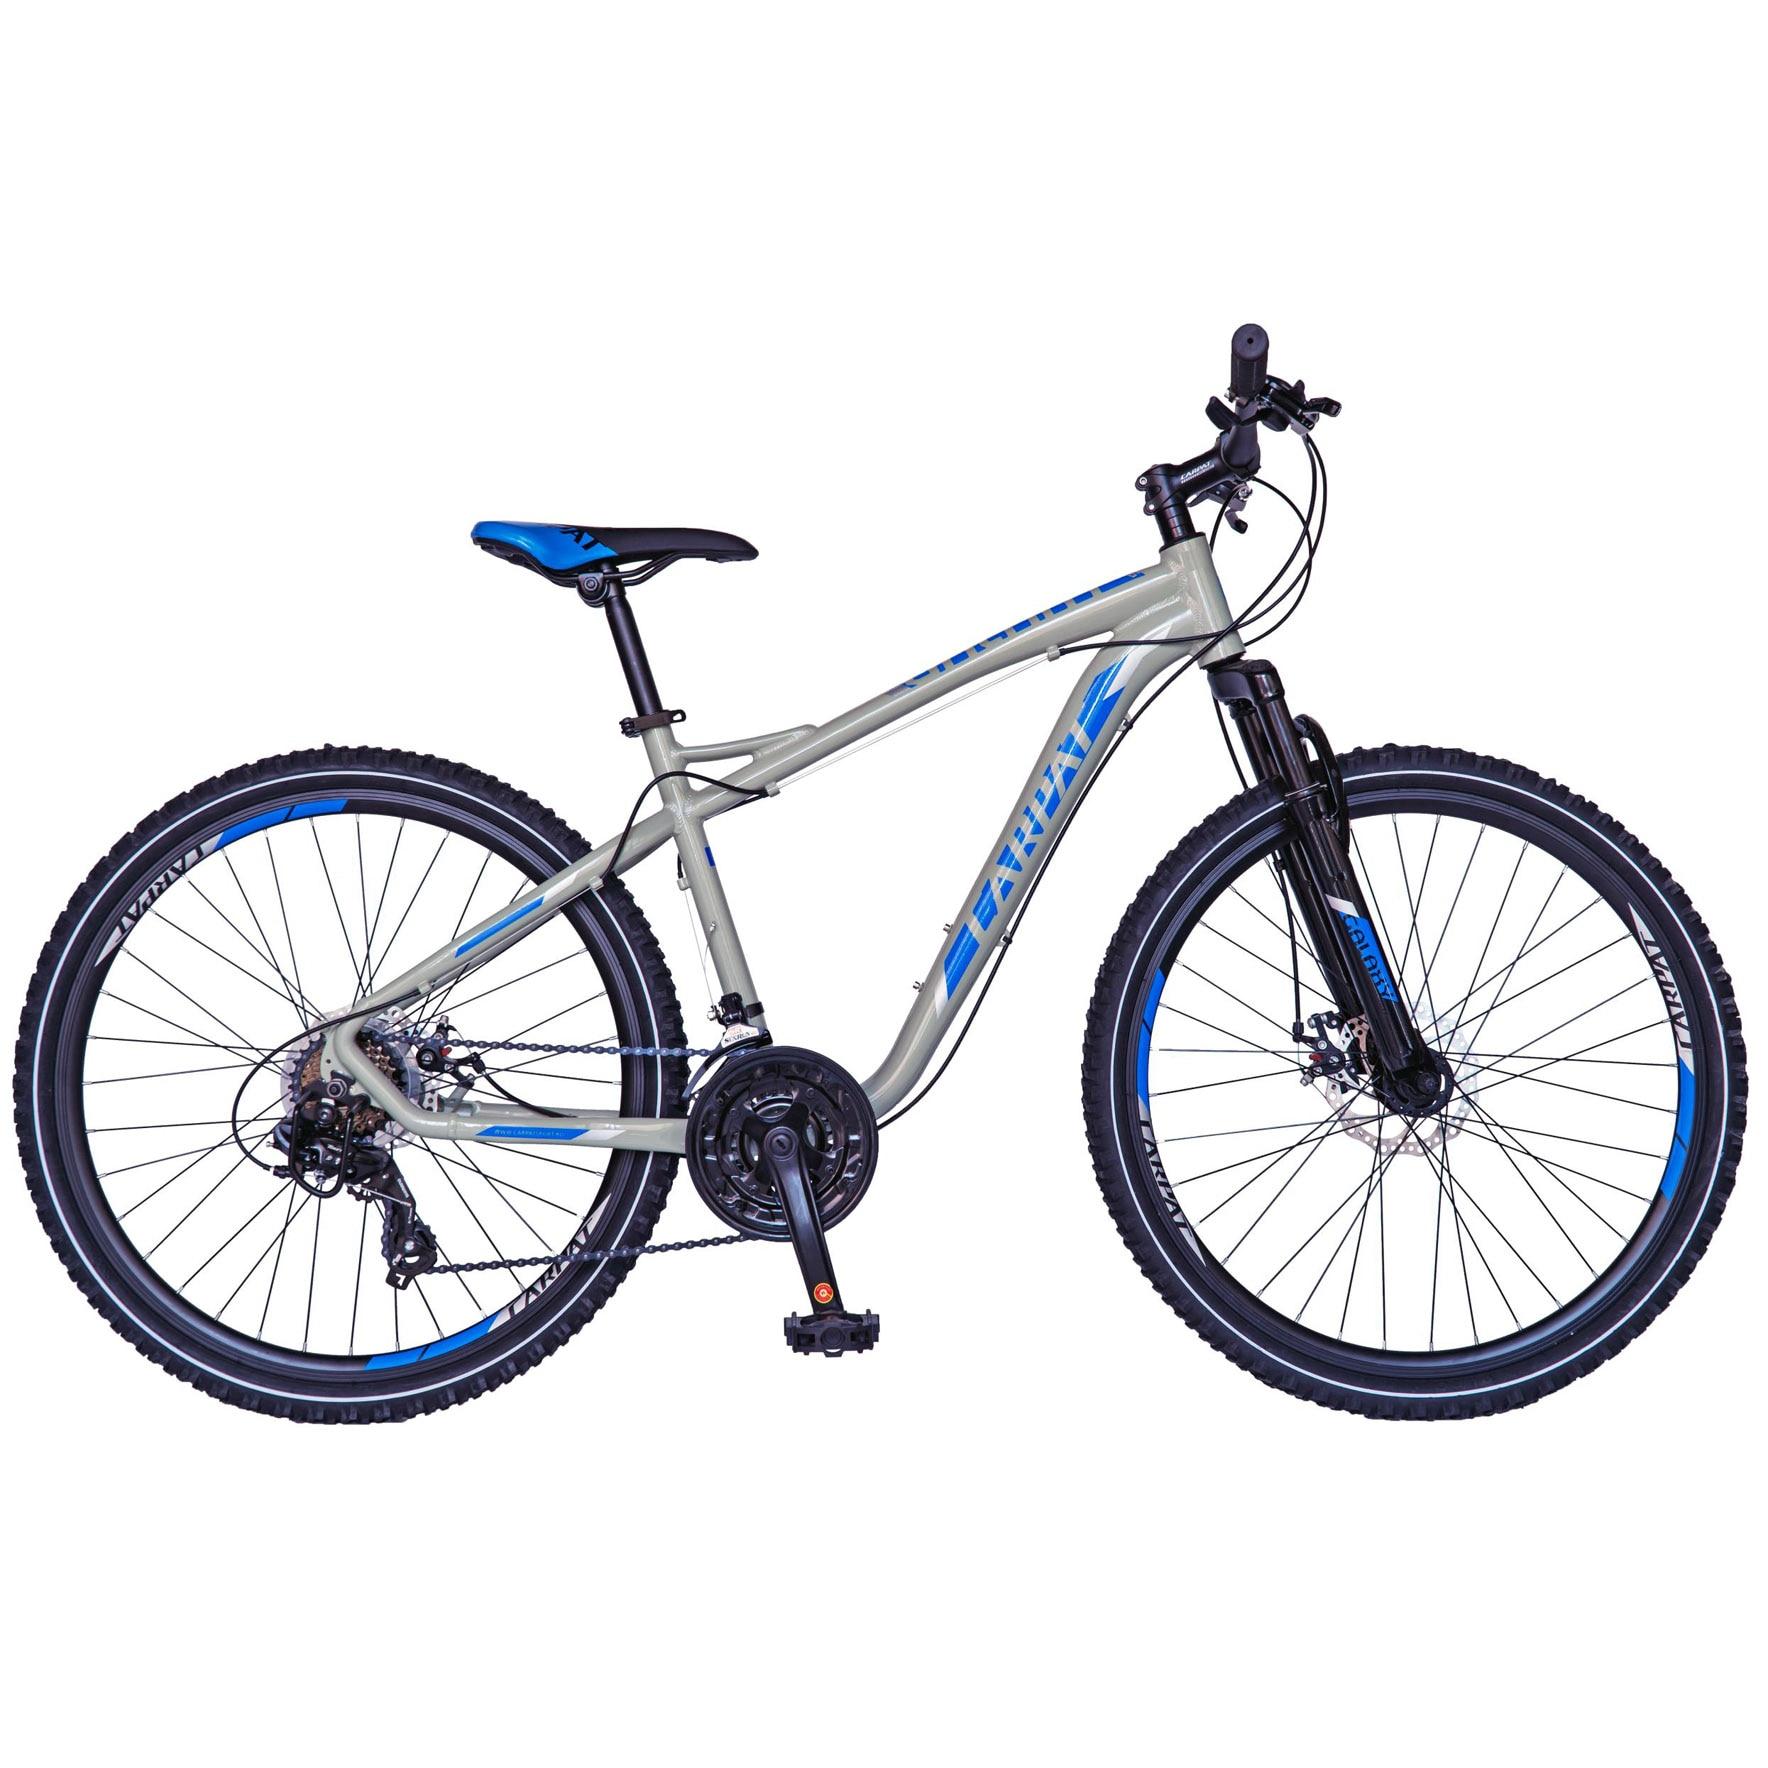 "Fotografie Bicicleta MTB 26"" Carpat C2693B cadru AL, frana disc, transmisie Shimano, Gri/Albastru"